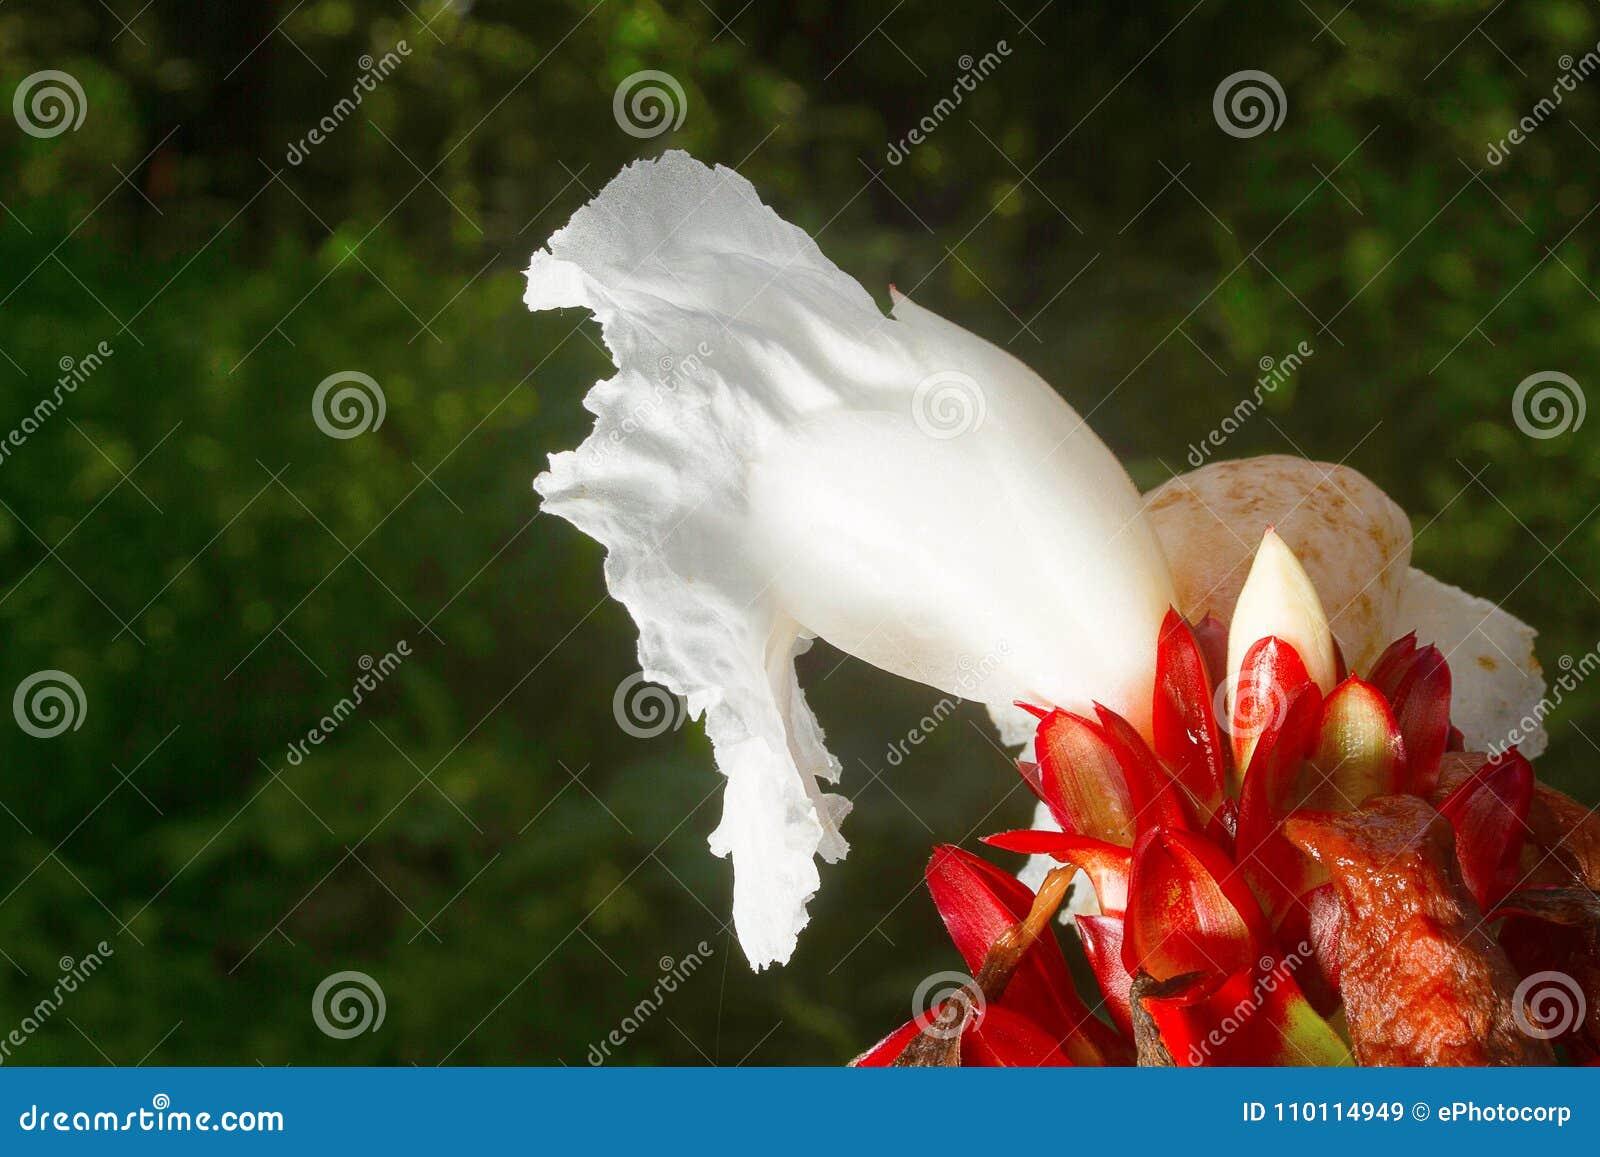 Flower Costus Sp Aarey Milk Colony India Stock Image Image Of